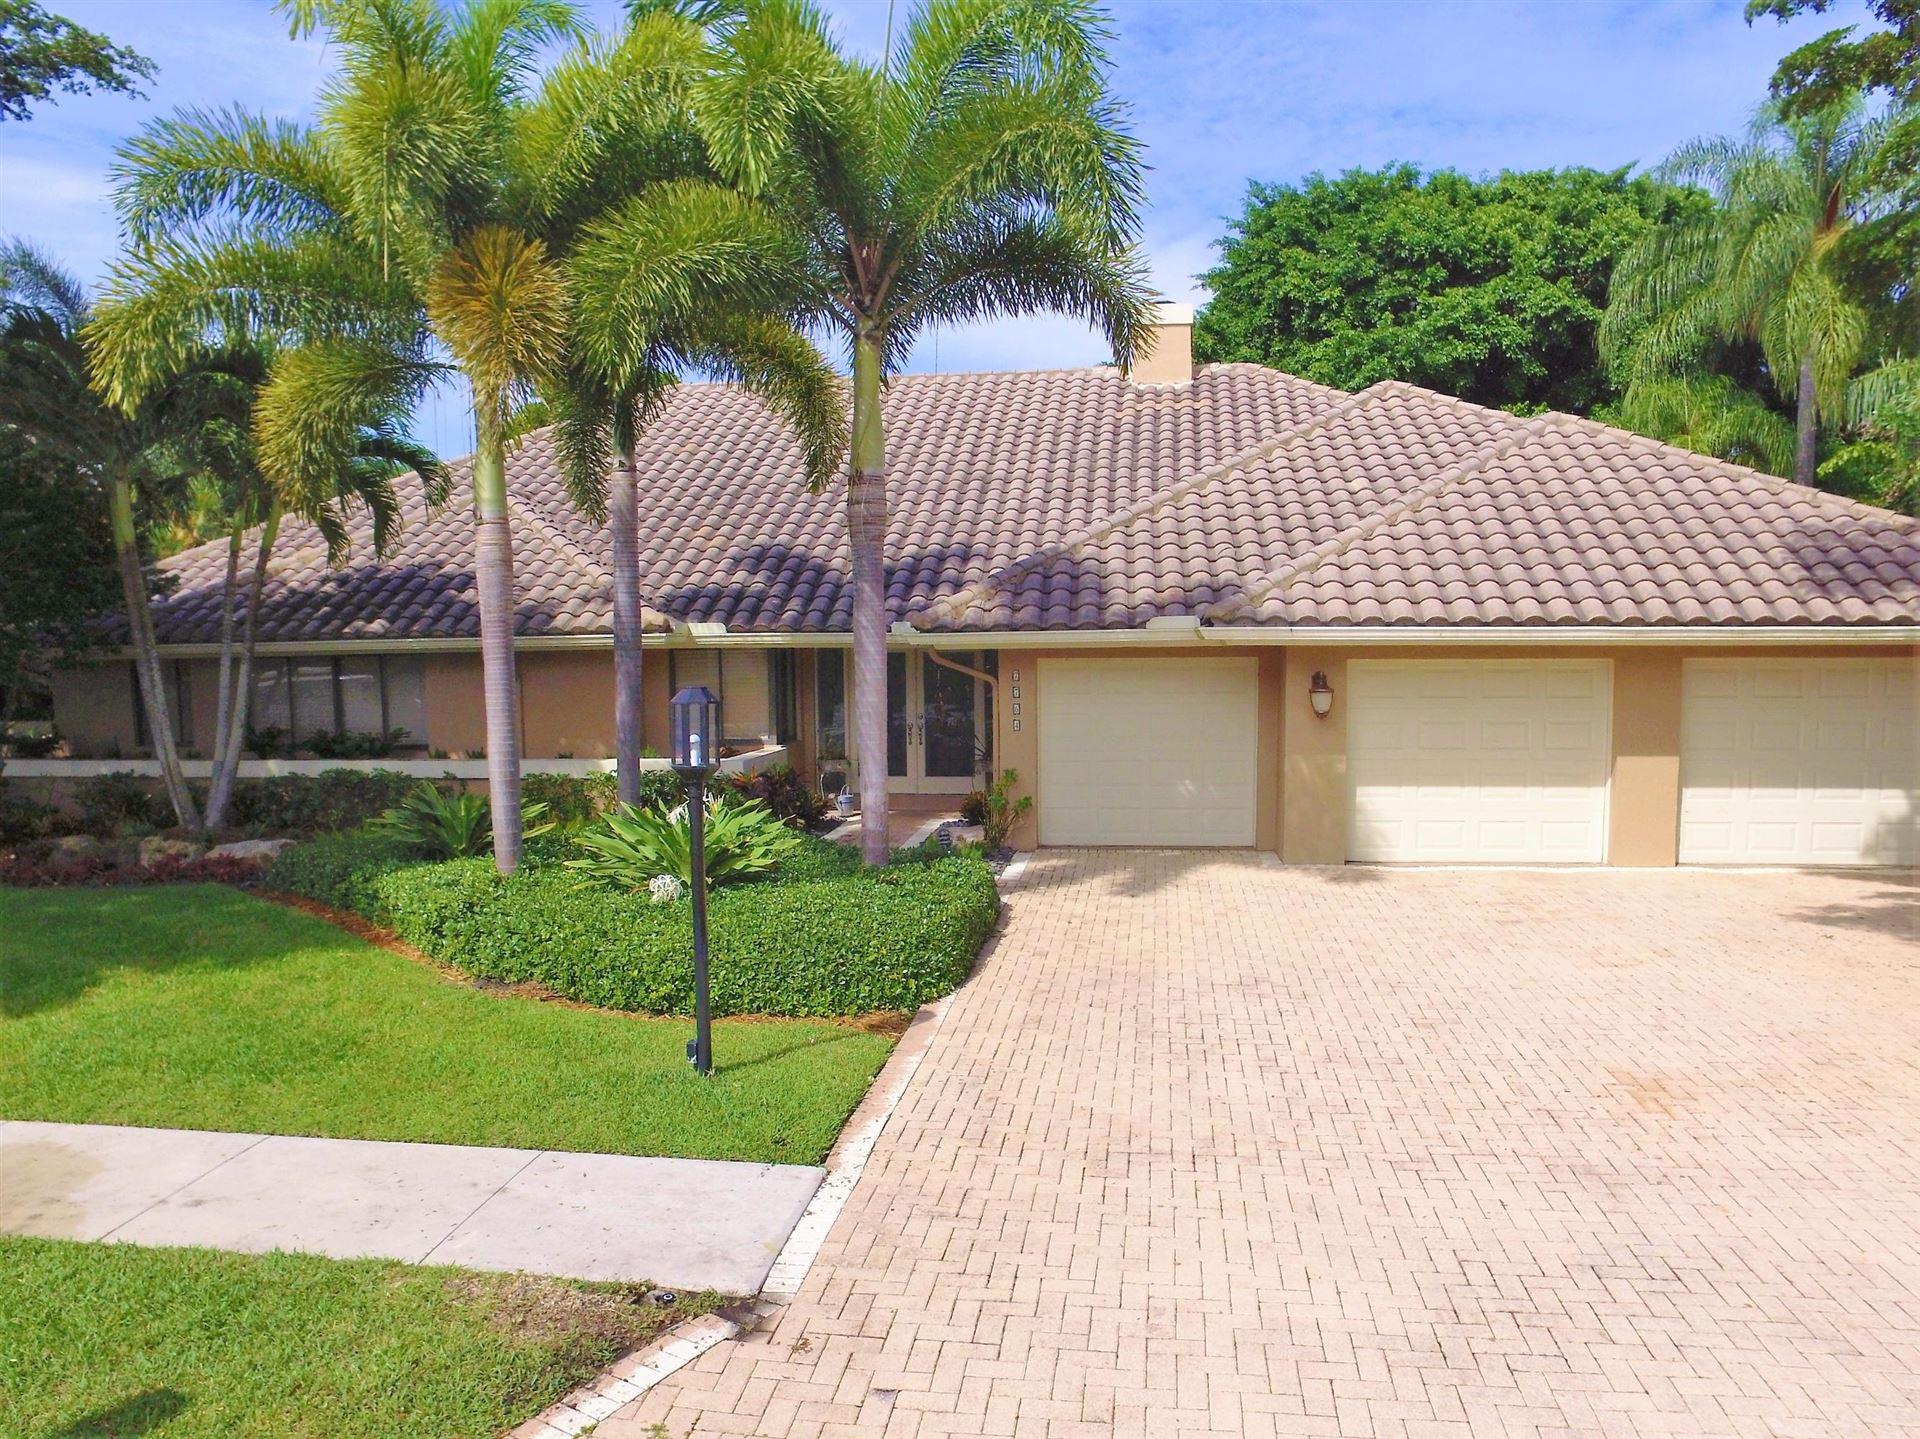 7764 Mandarin Drive, Boca Raton, FL 33433 - #: RX-10751073